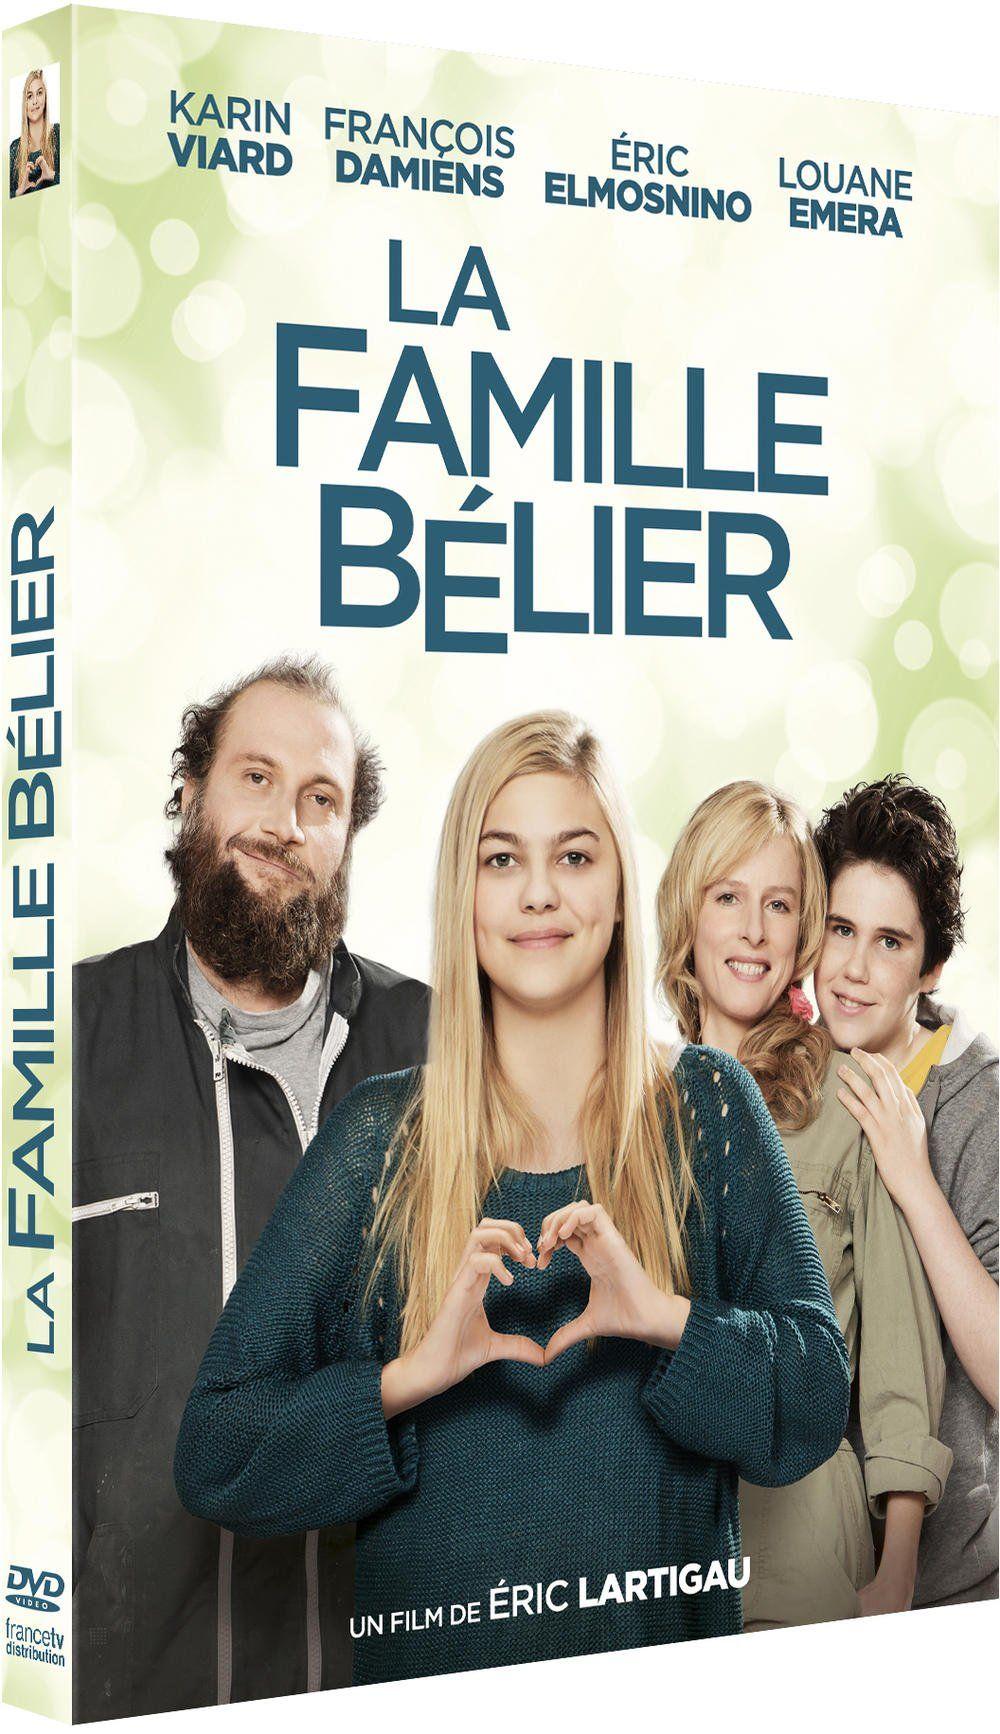 Film Complet Vf Streaming Gratuit La Famille B駘ier